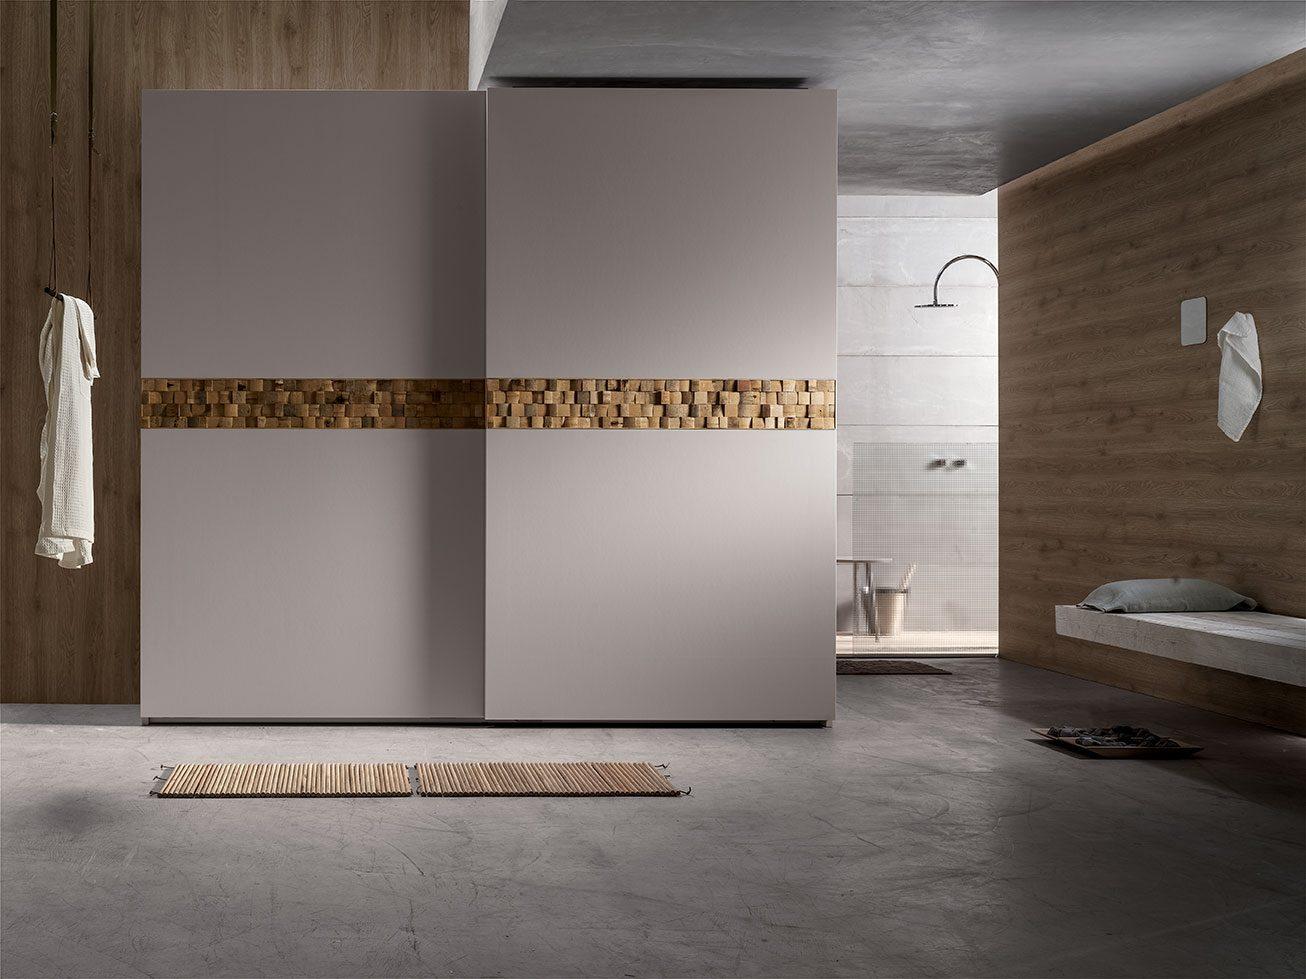 Emejing Armadio Santa Lucia Images - Idee Arredamento Casa ...